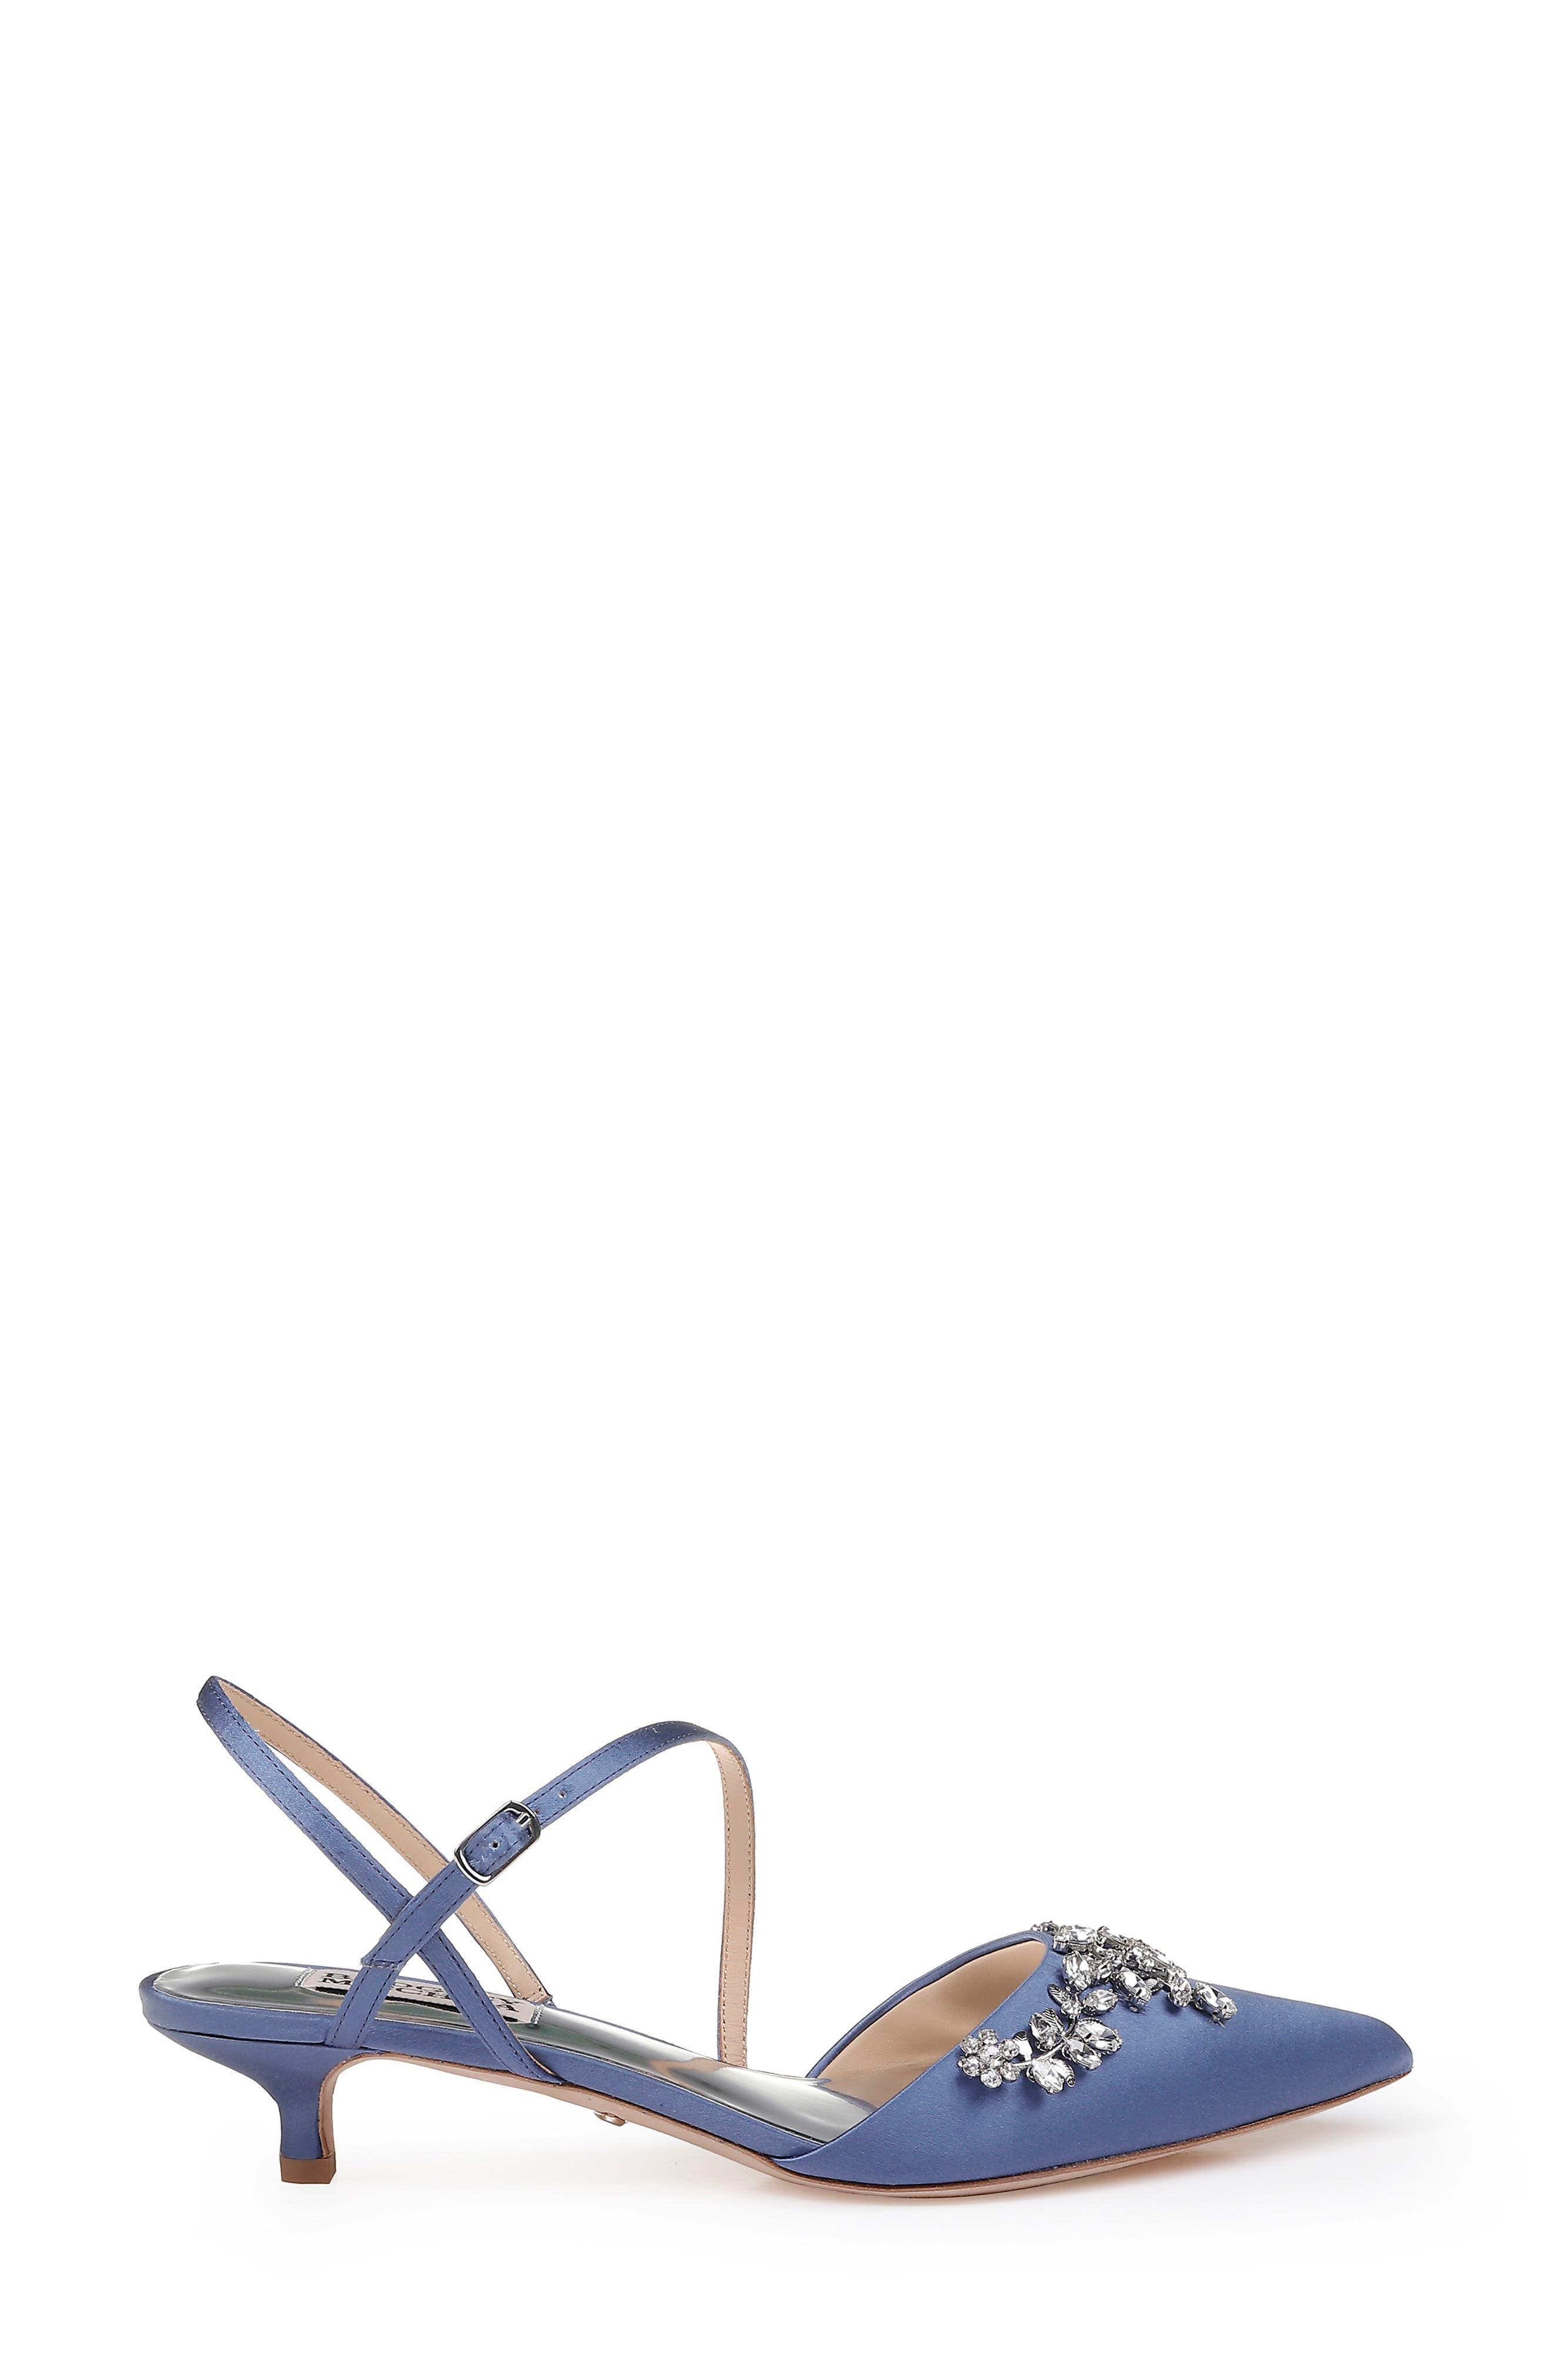 ,                             Badgley Mischka Crystal Embellished Quarter Strap Pump,                             Alternate thumbnail 3, color,                             ITALIAN BLUE SATIN